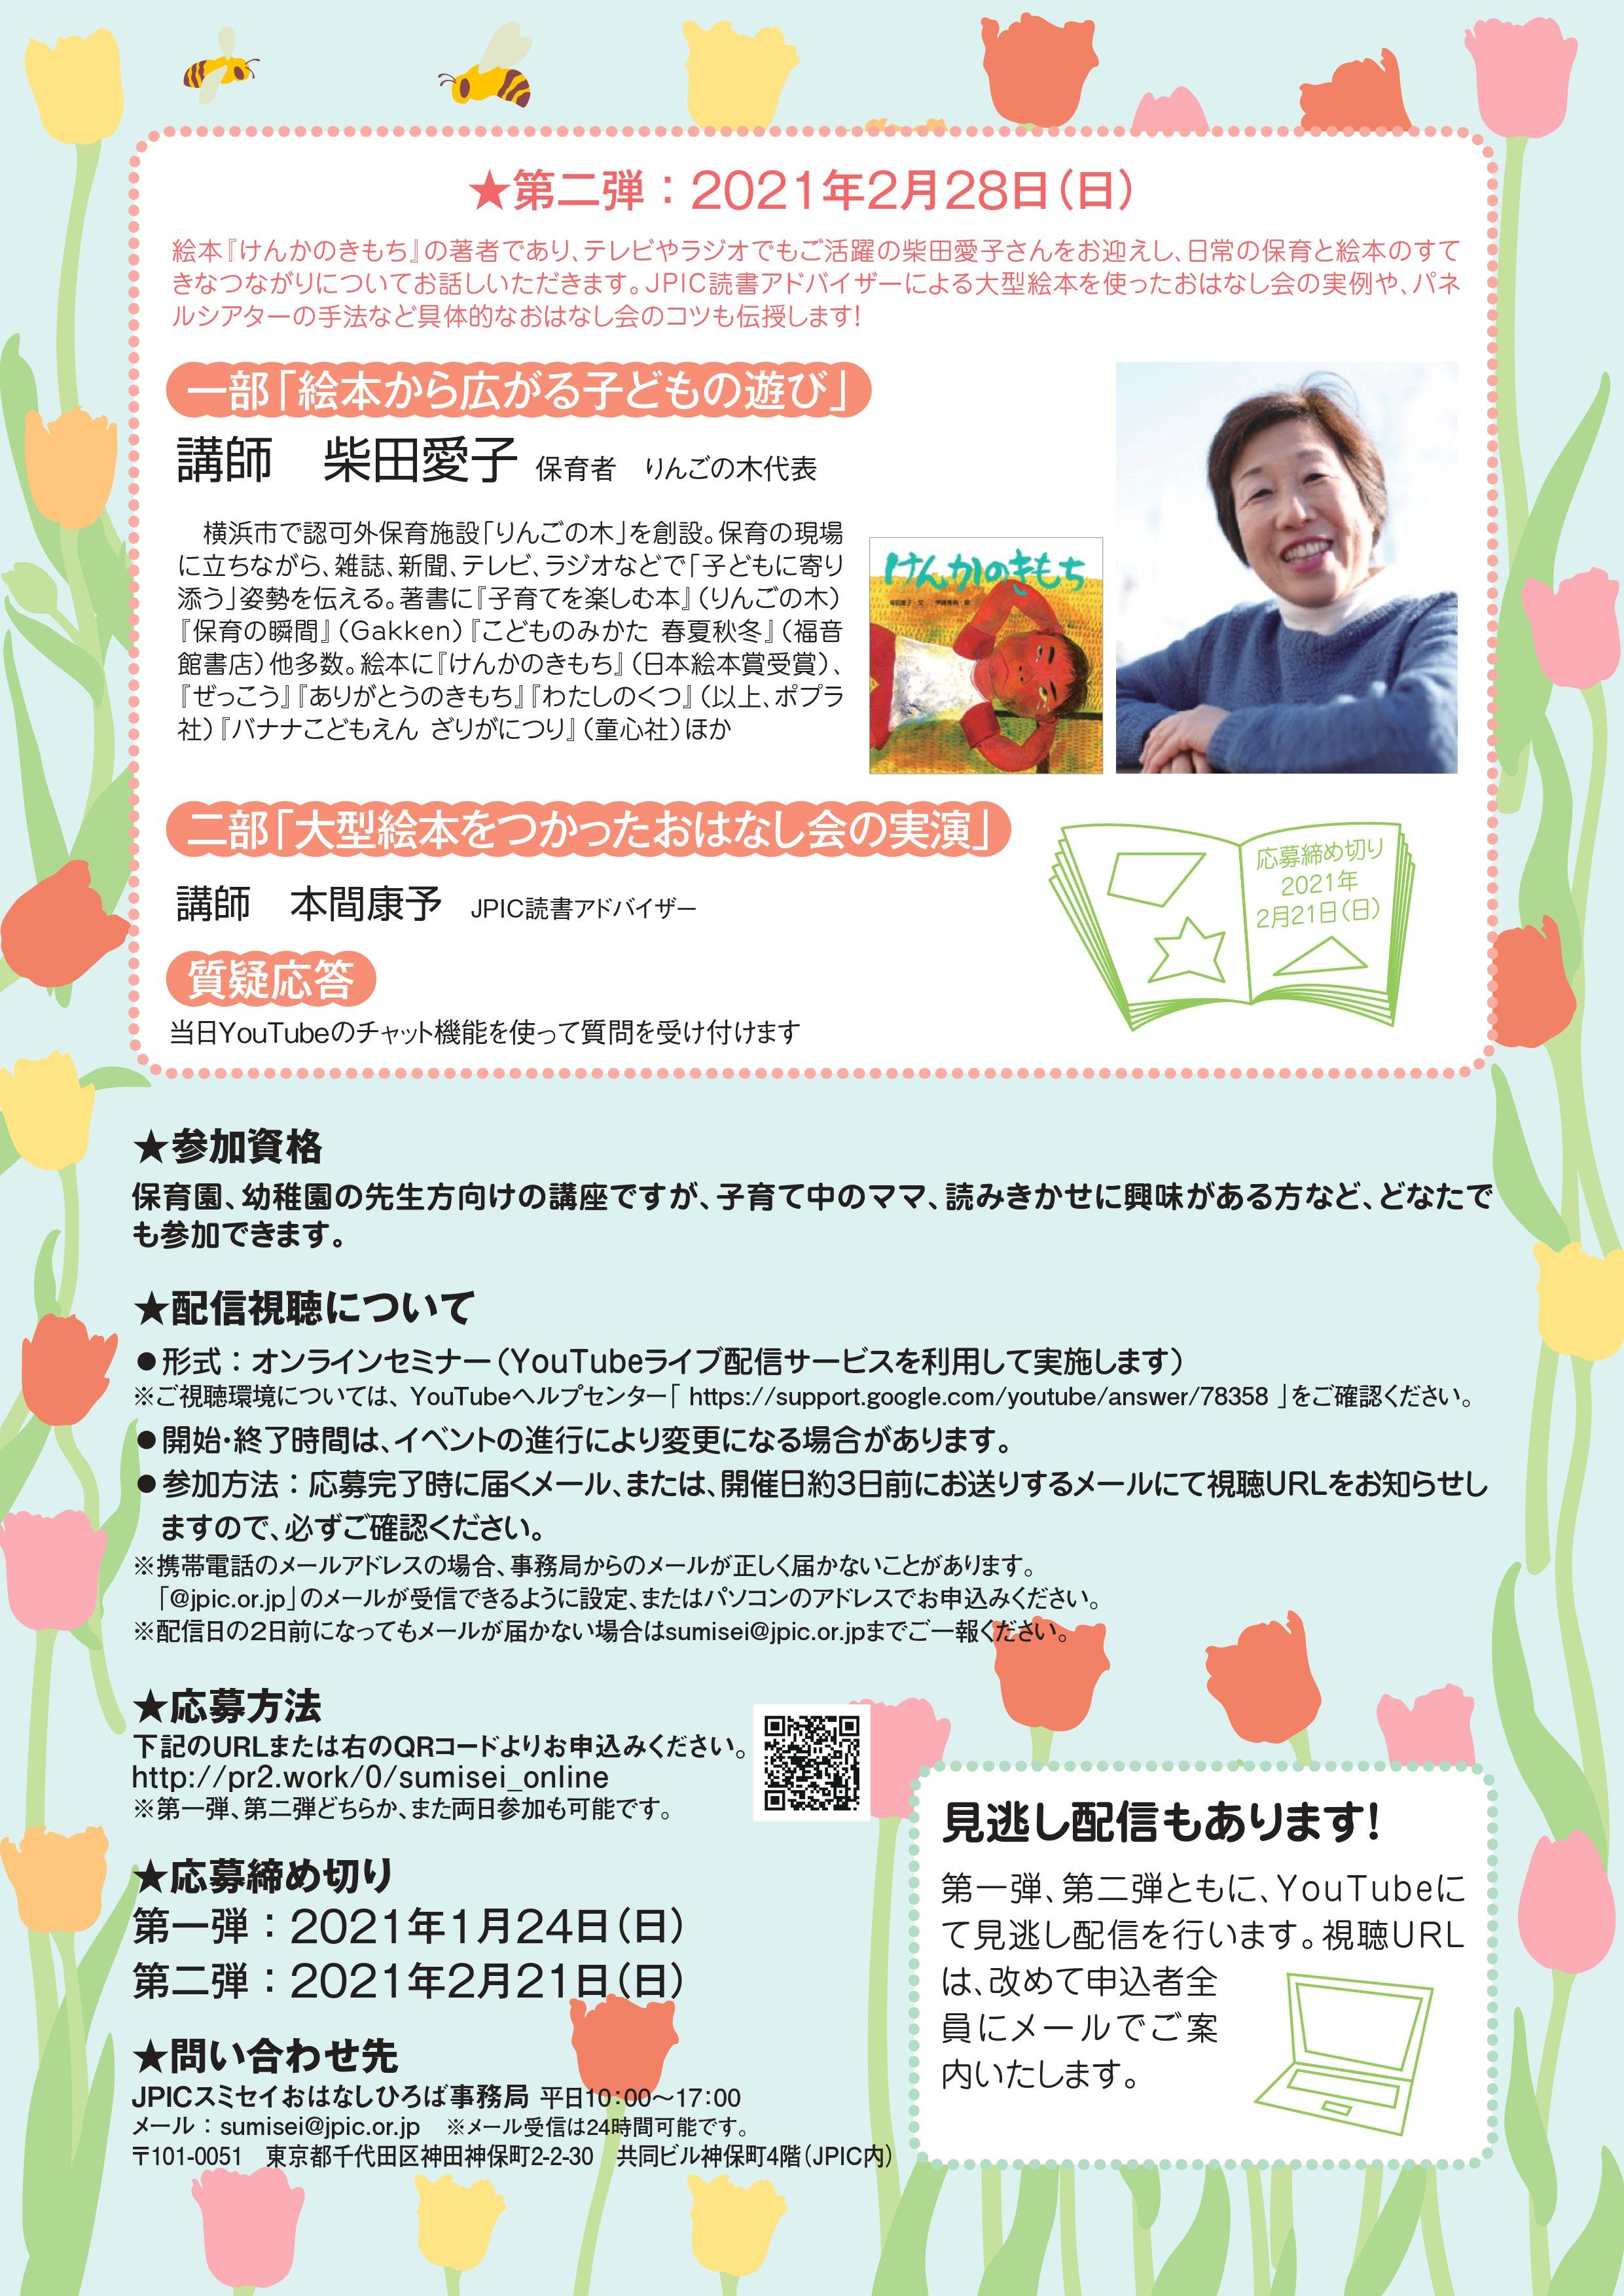 sumisei_online2020_02.jpg